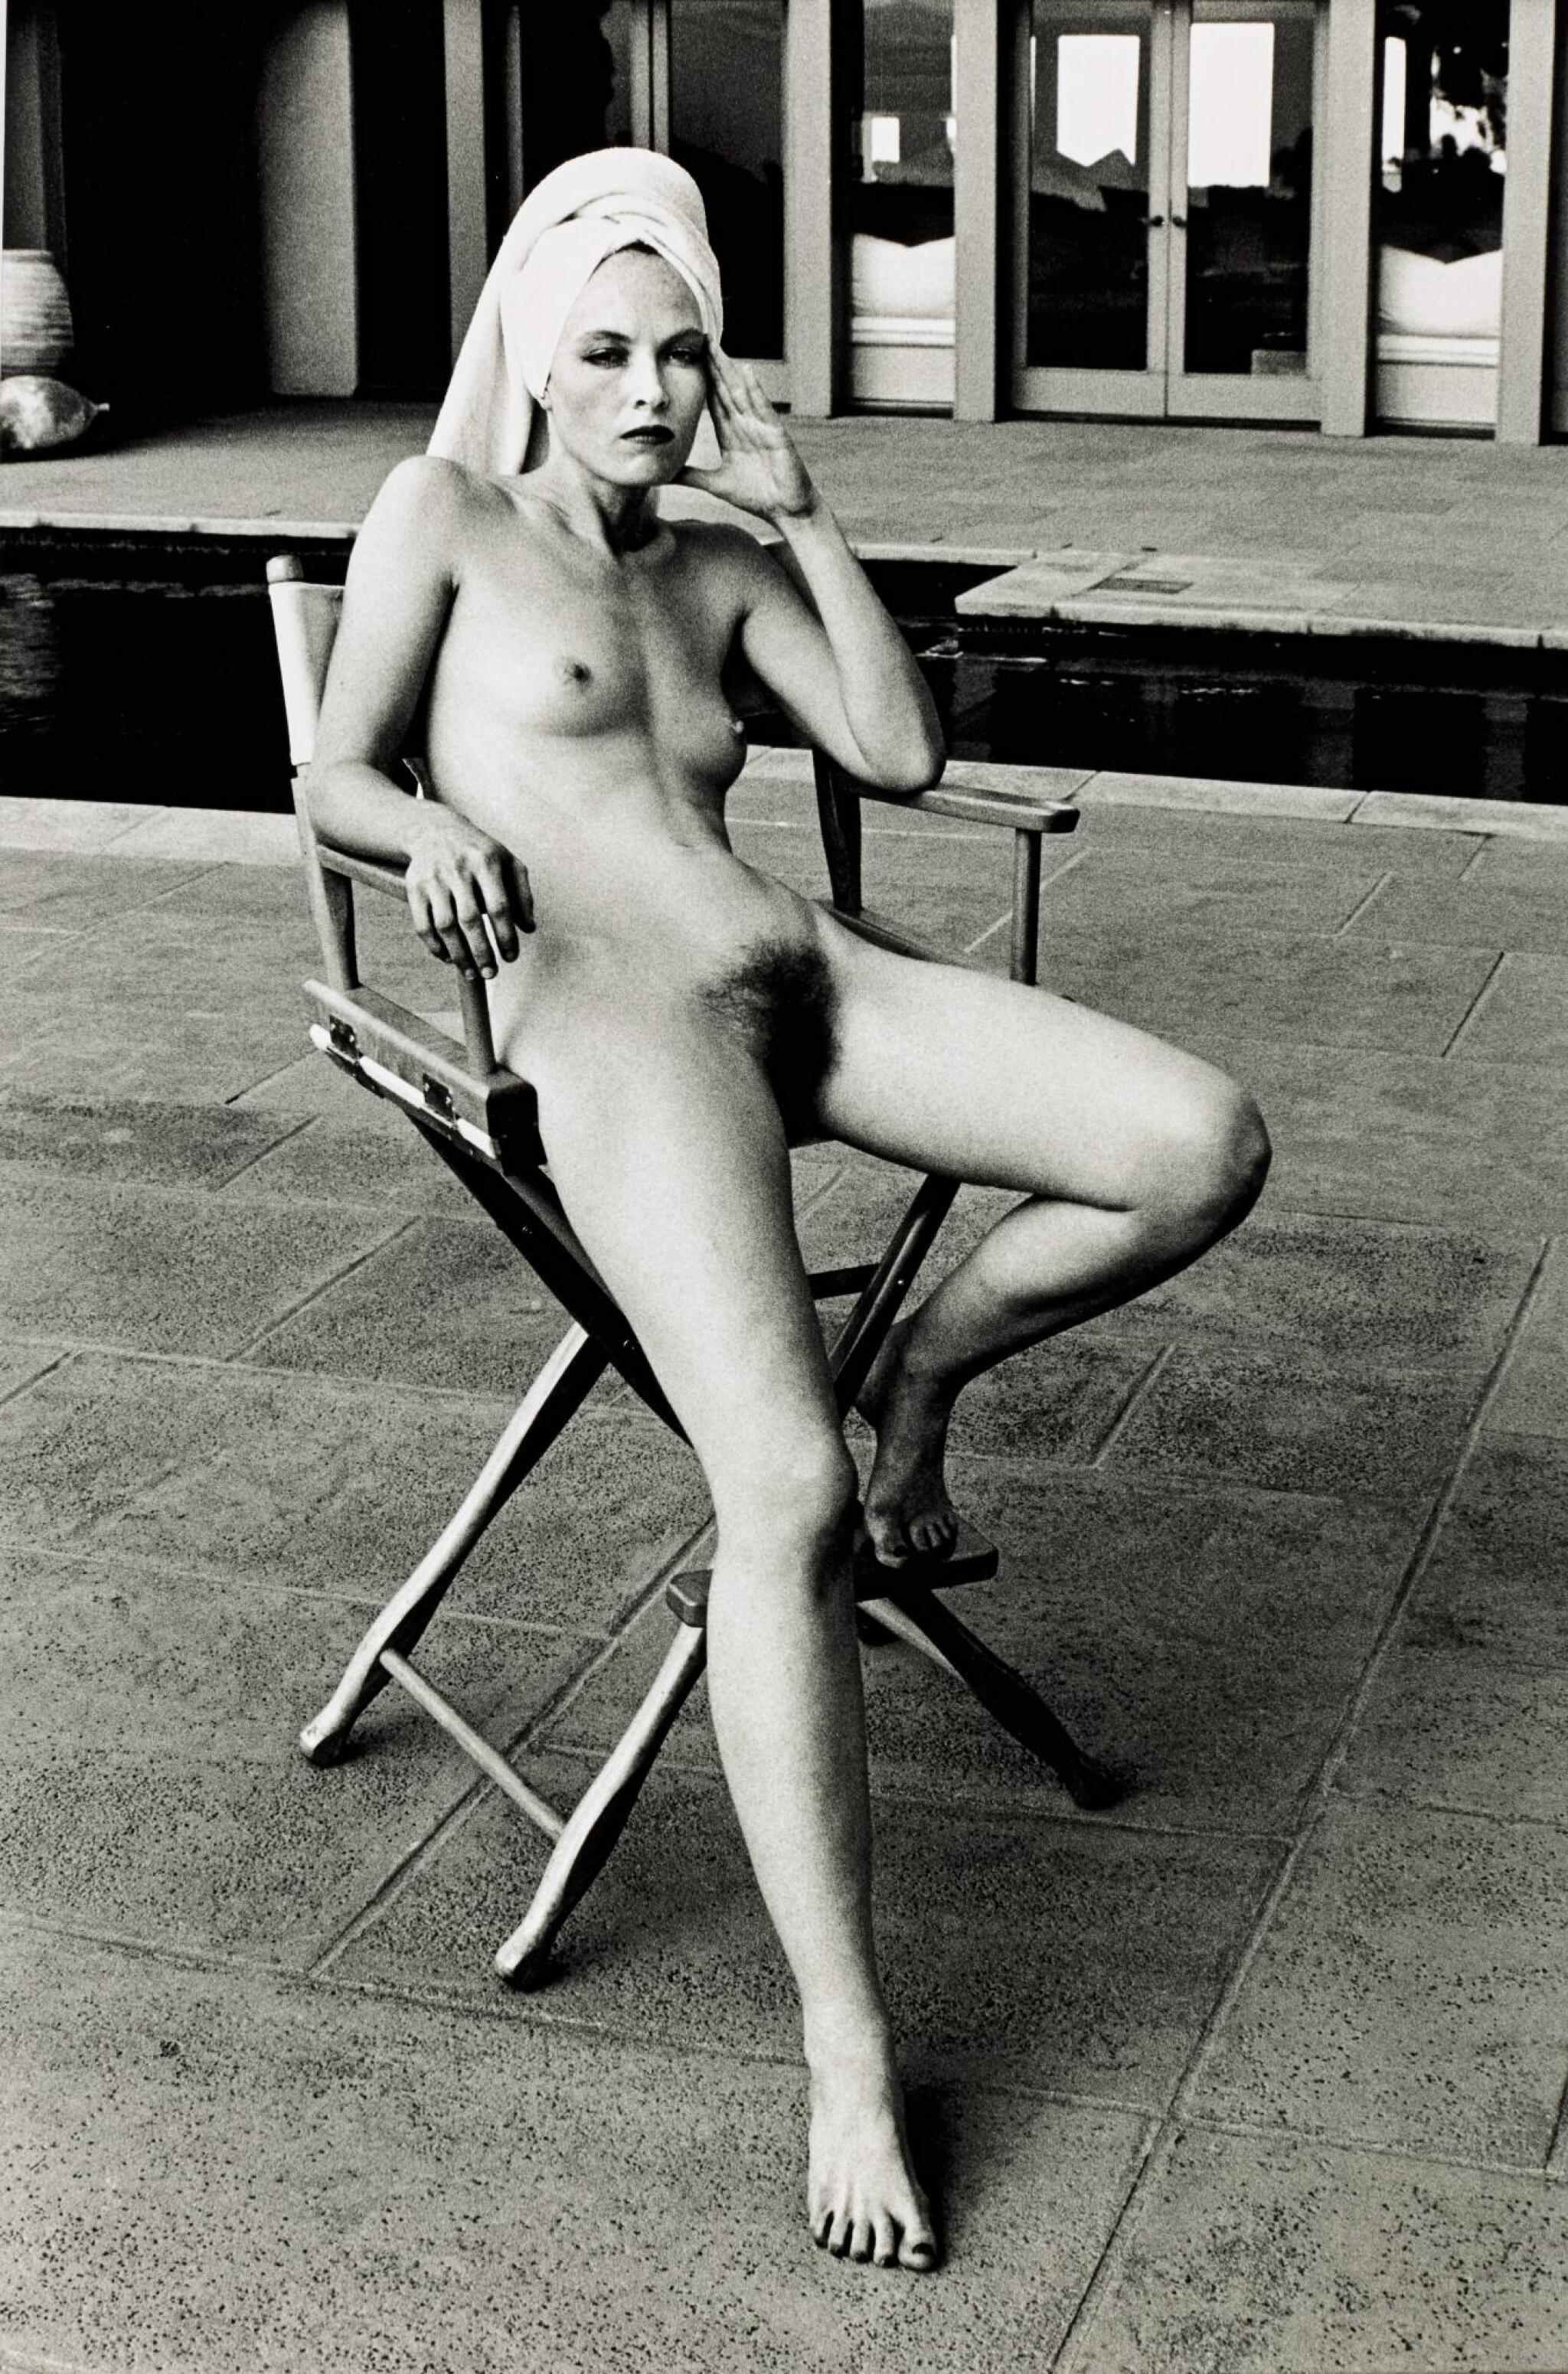 View 1 of Lot 66. HELMUT NEWTON | 'MISS LIVINGSTONE (SITTING)', BEVERLY HILLS, 1981.